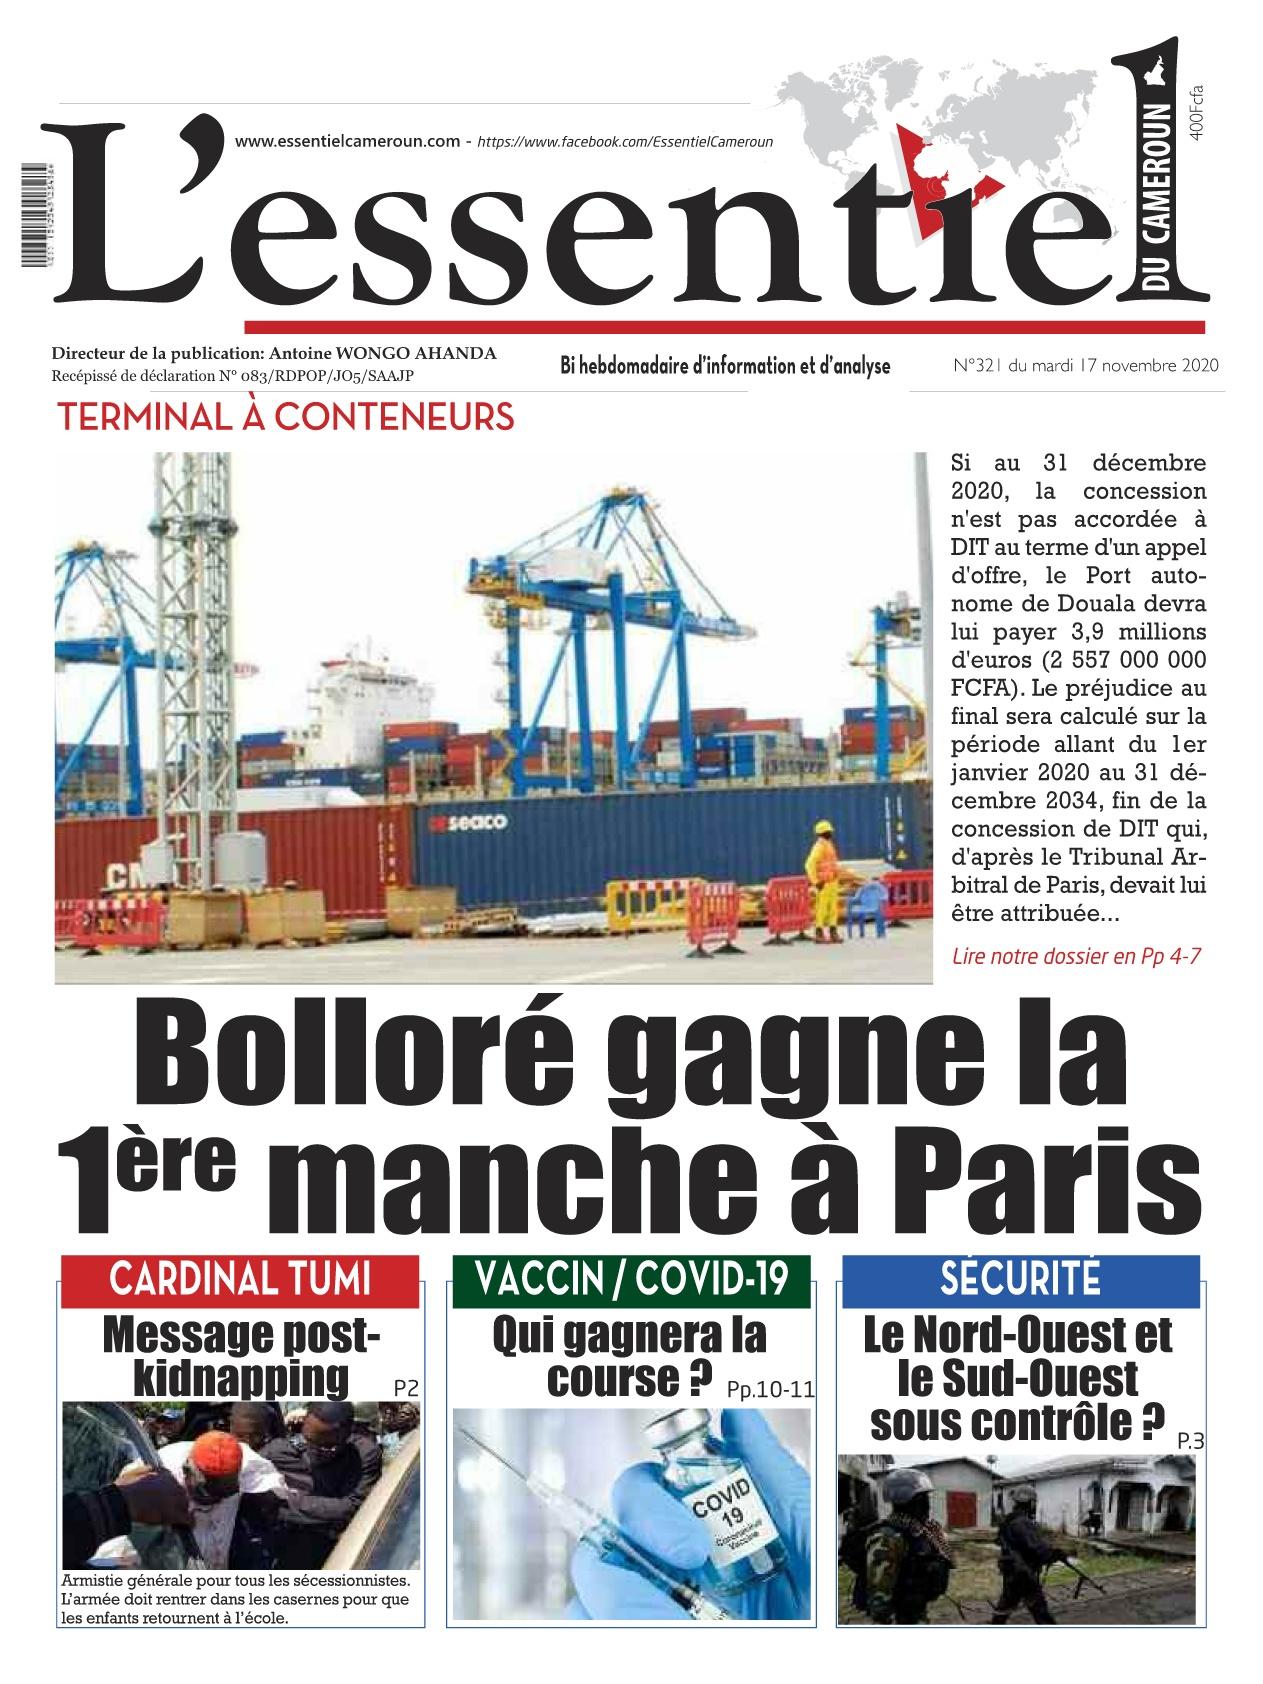 L'essentiel du Cameroun - 17/11/2020